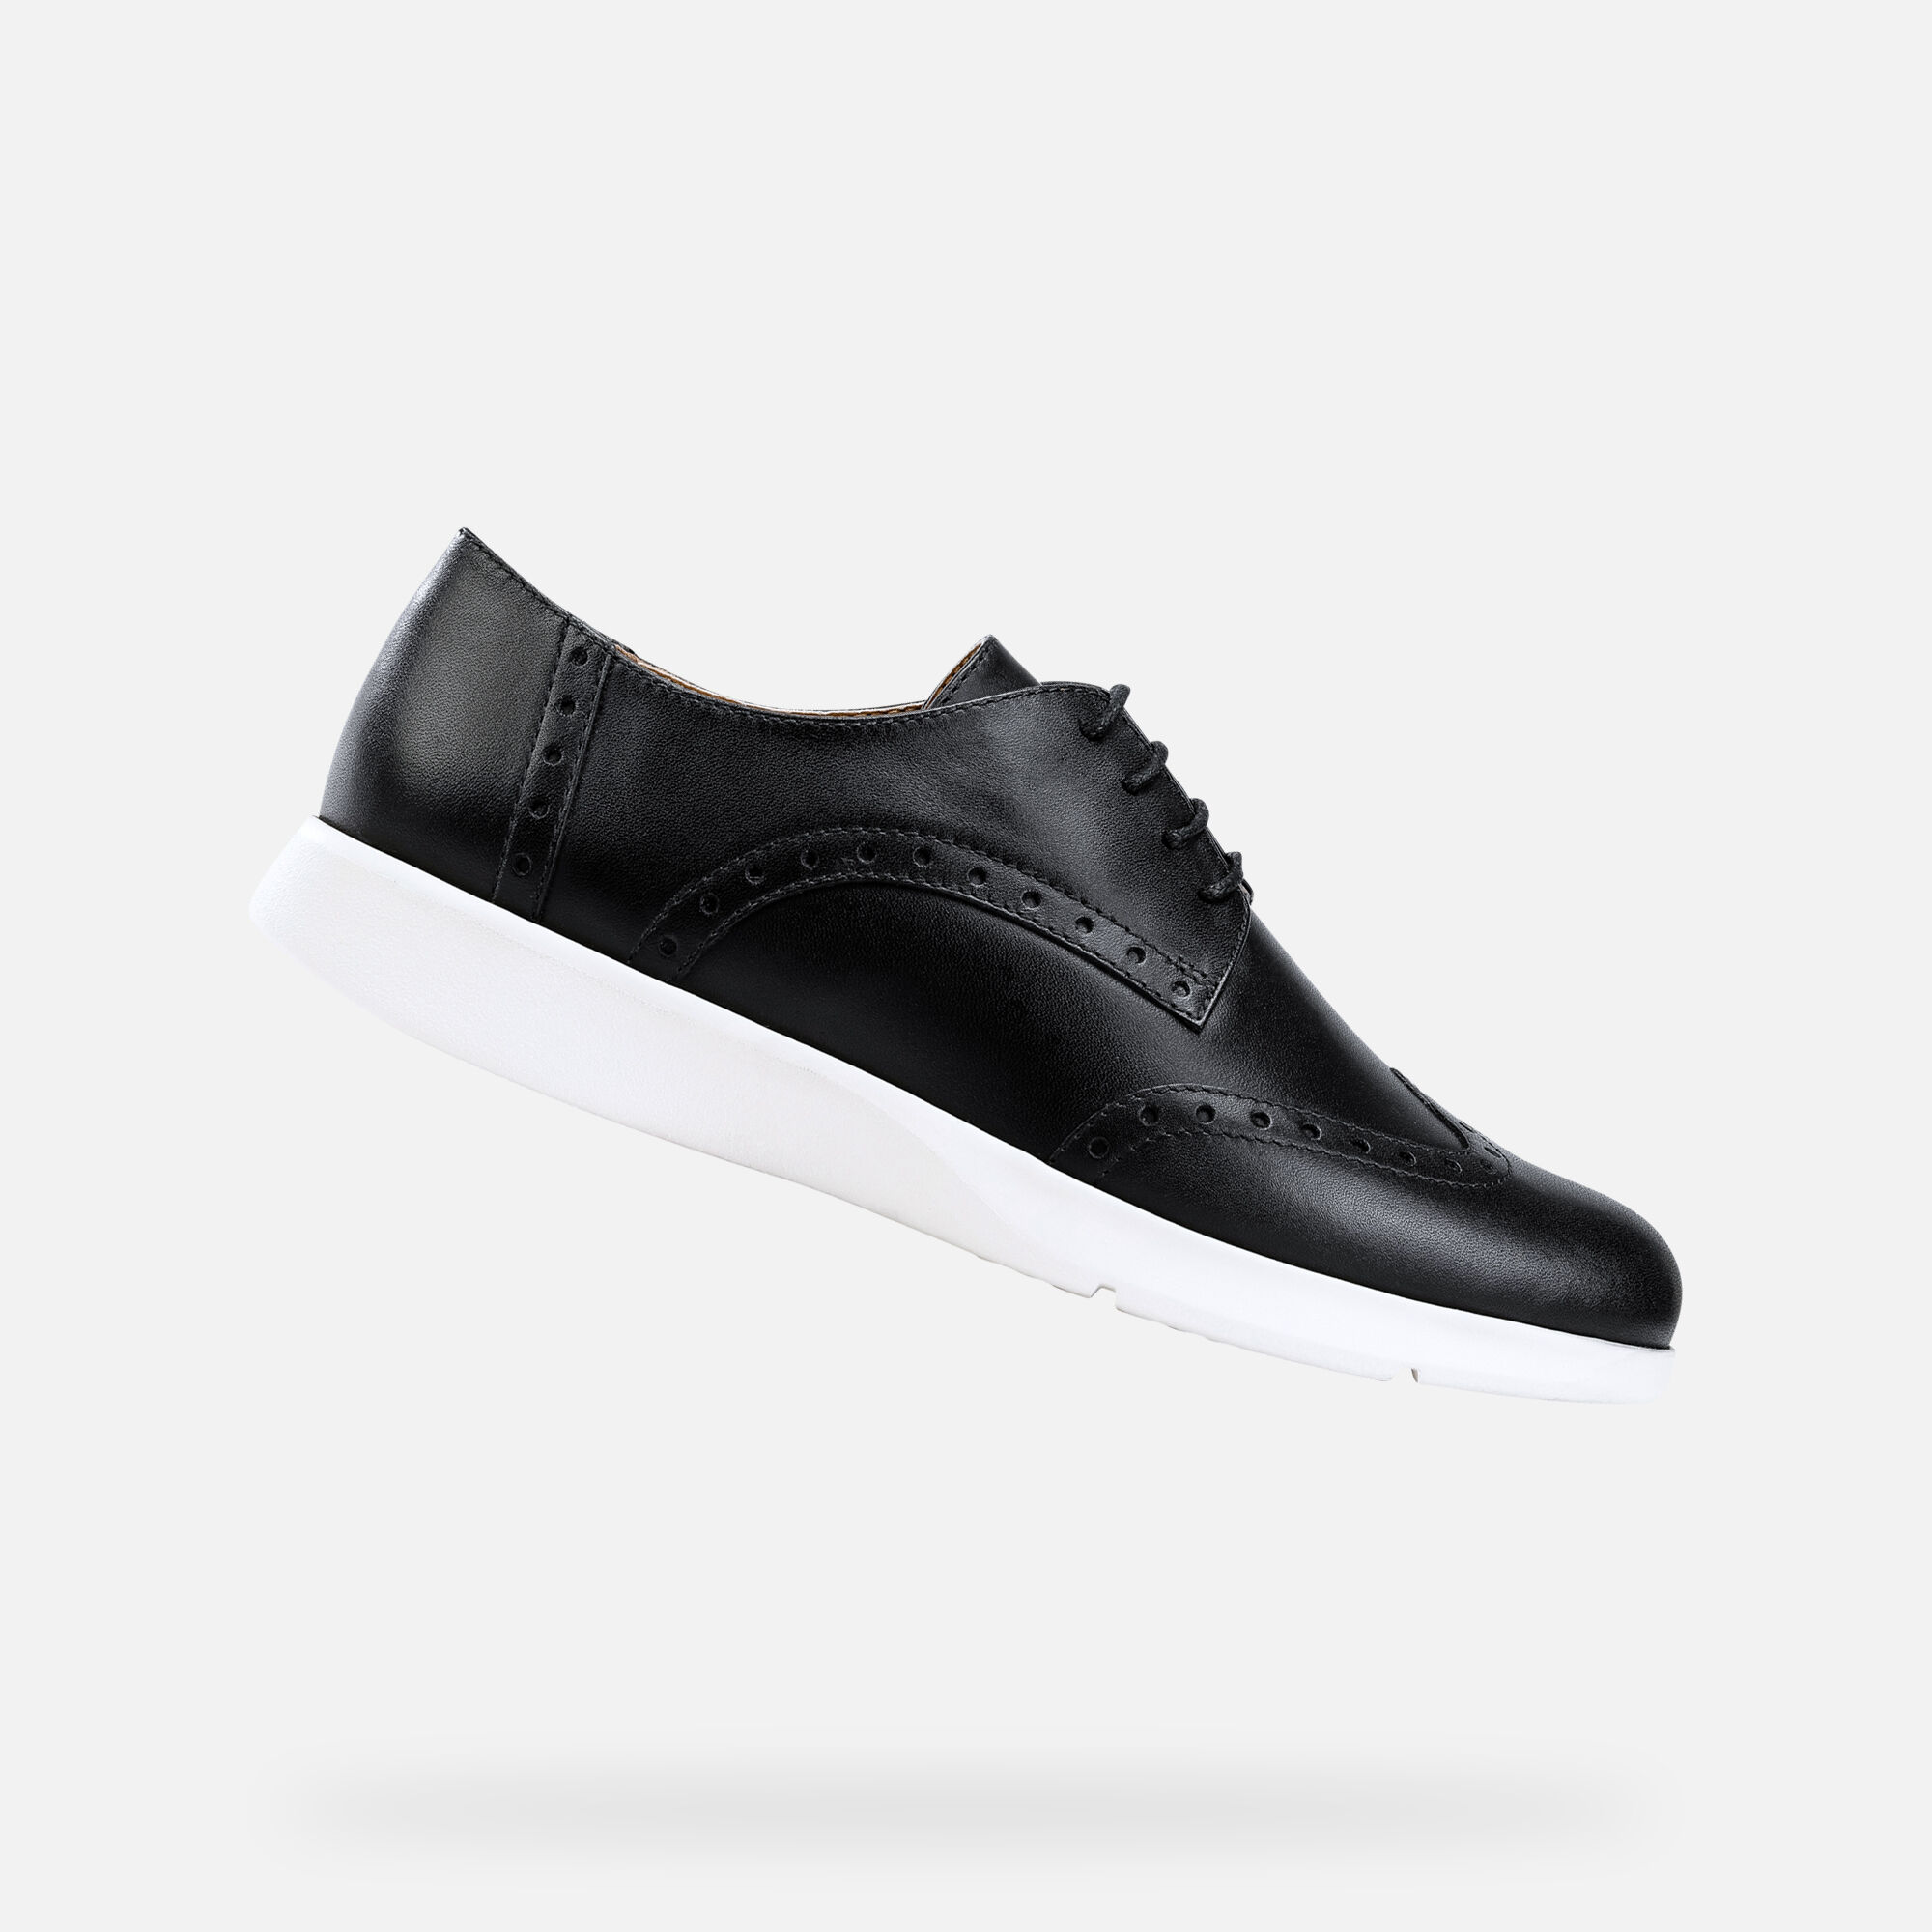 Geox D ARJOLA: Black Woman Shoes | Geox